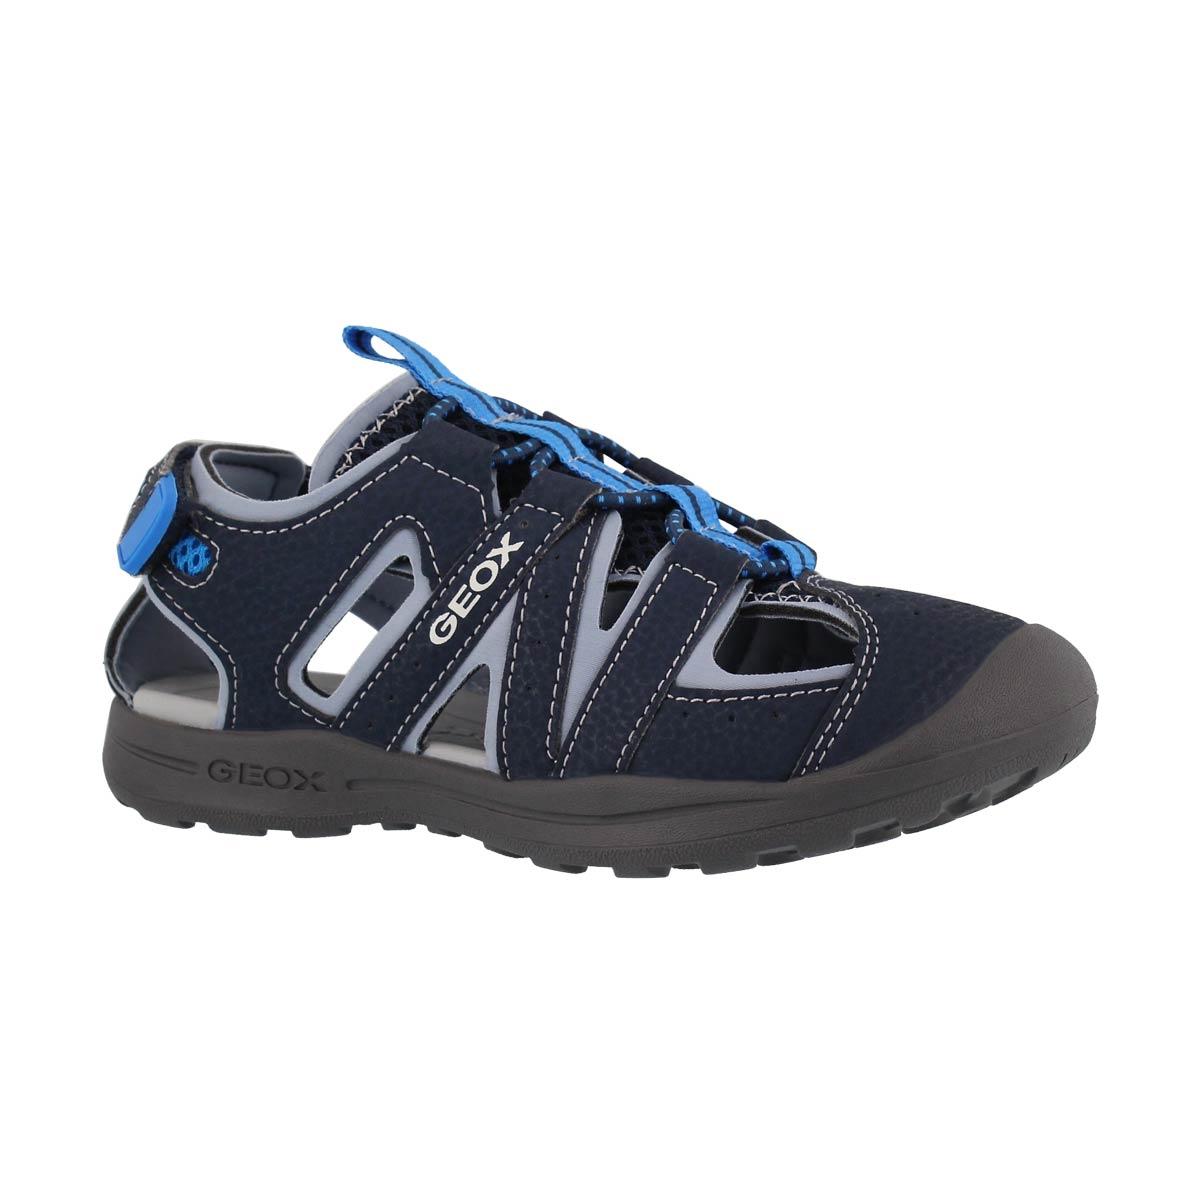 Boys' VANIETT navy/sky fisherman sandals